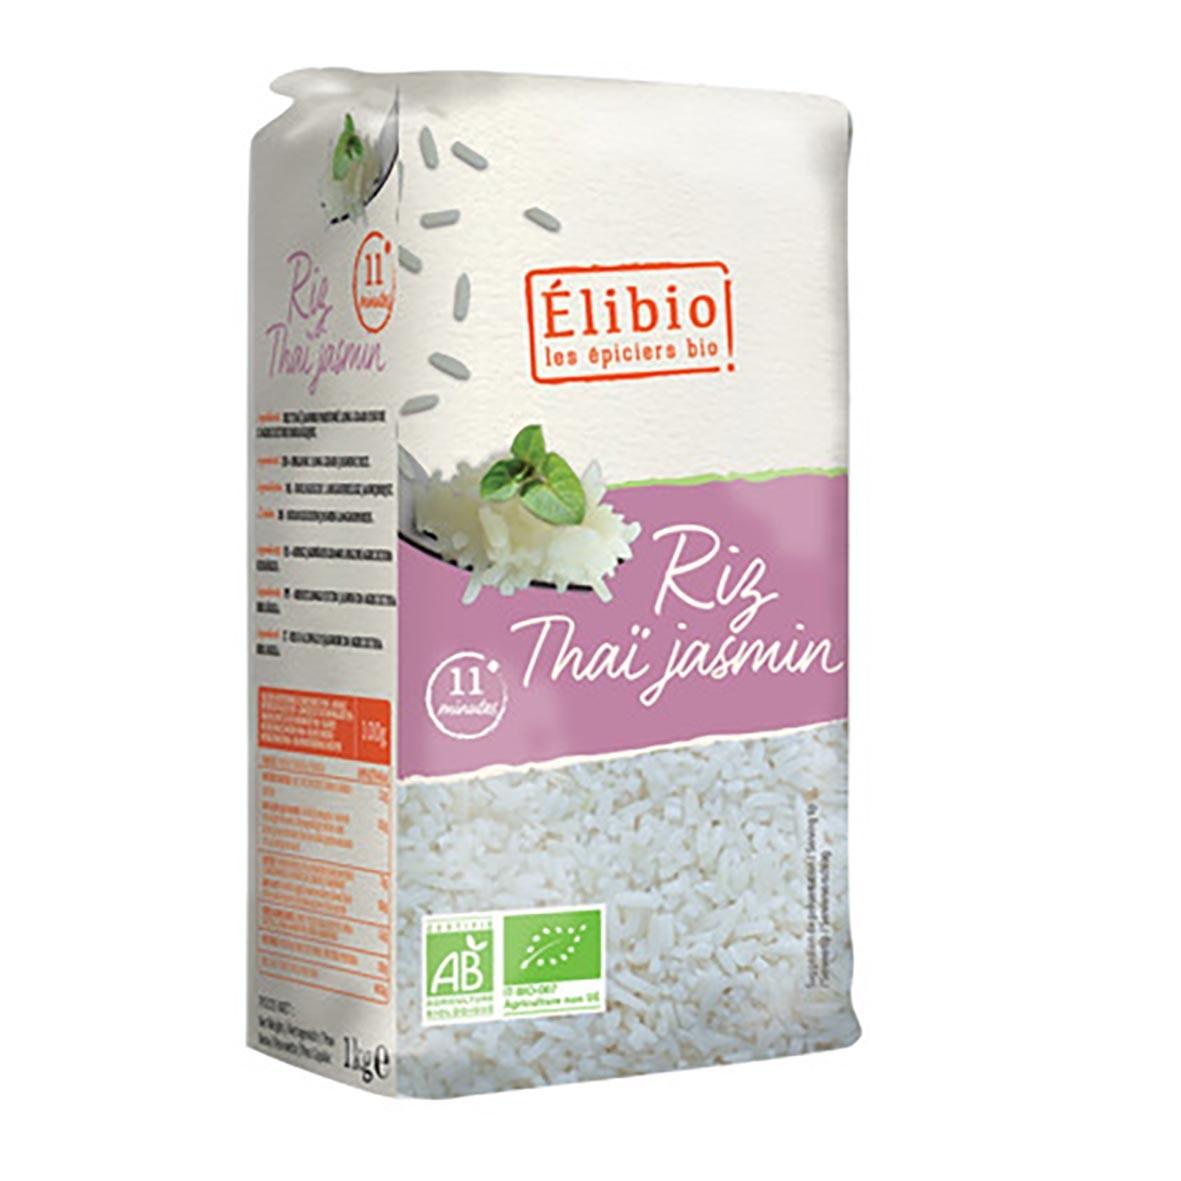 Riz thaï jasmin blanc 1kg bio - Elibio